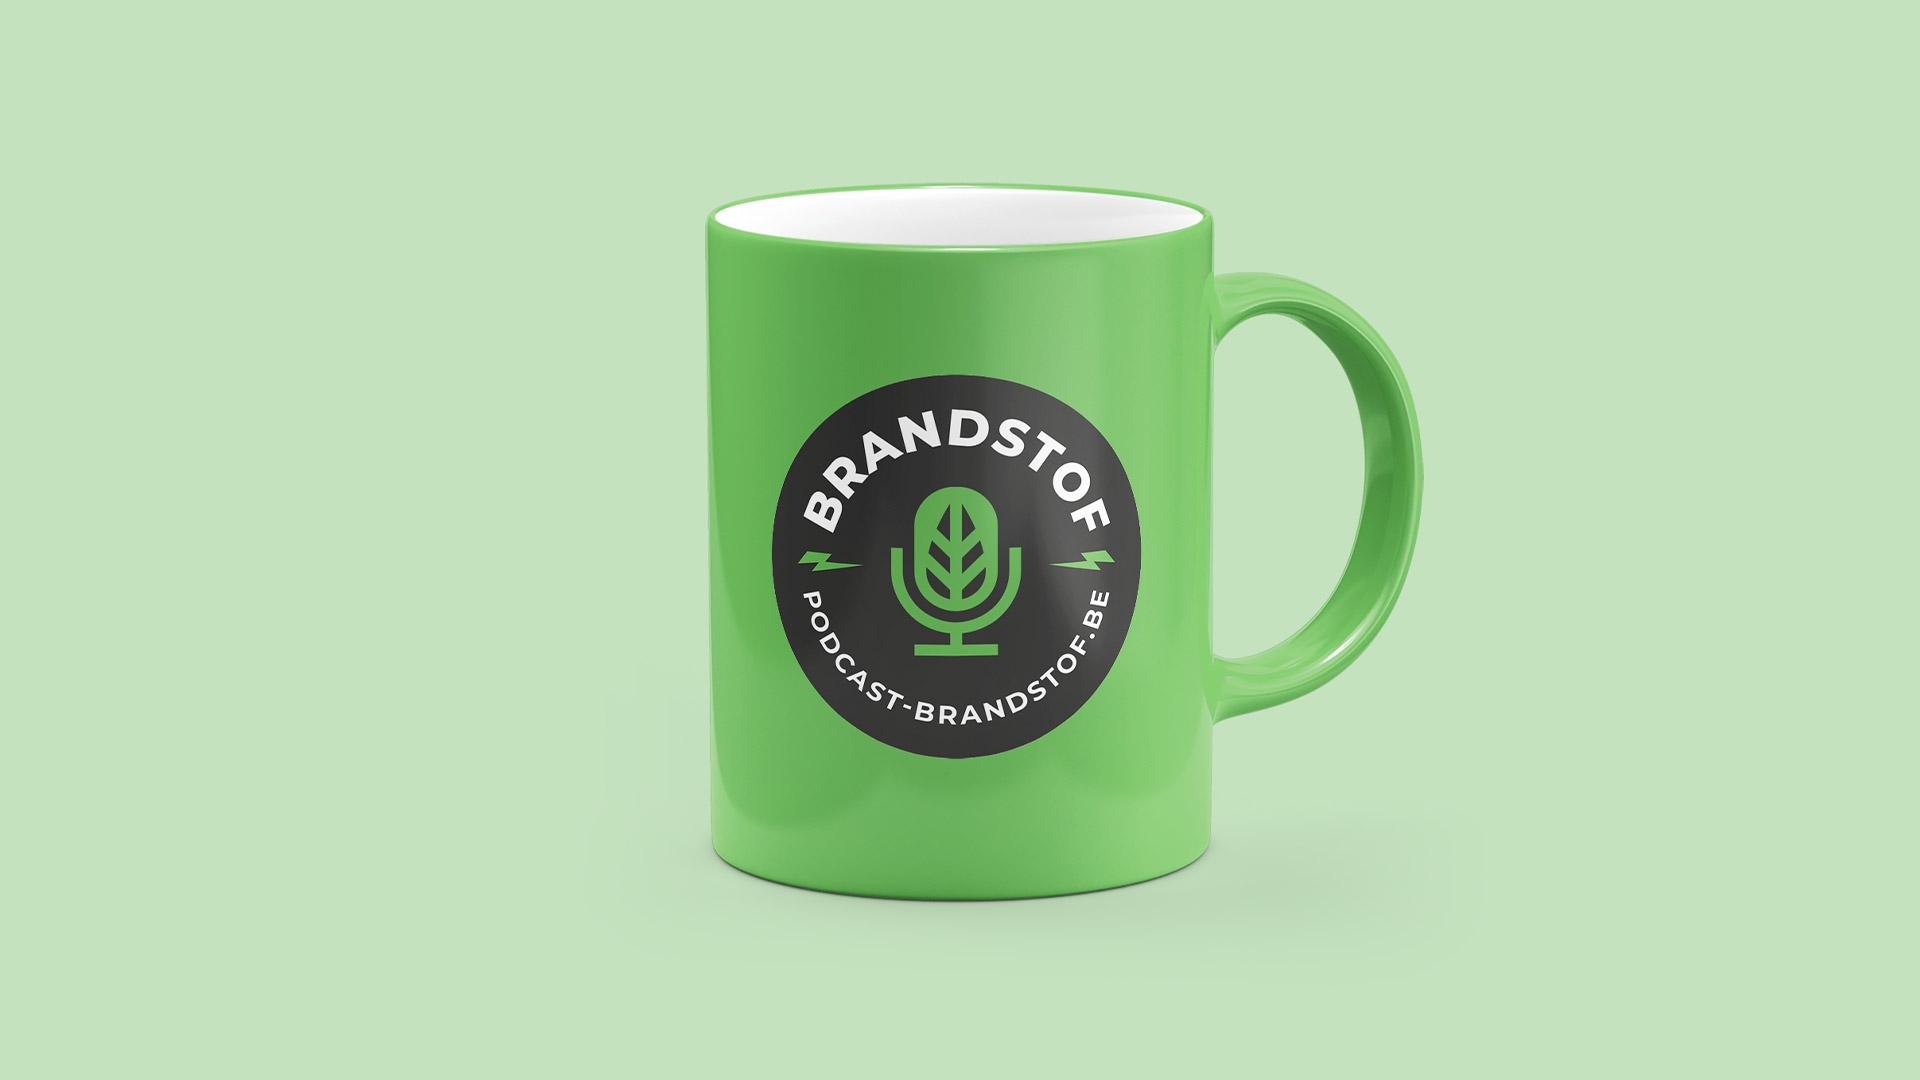 Brandstof Podcast mug